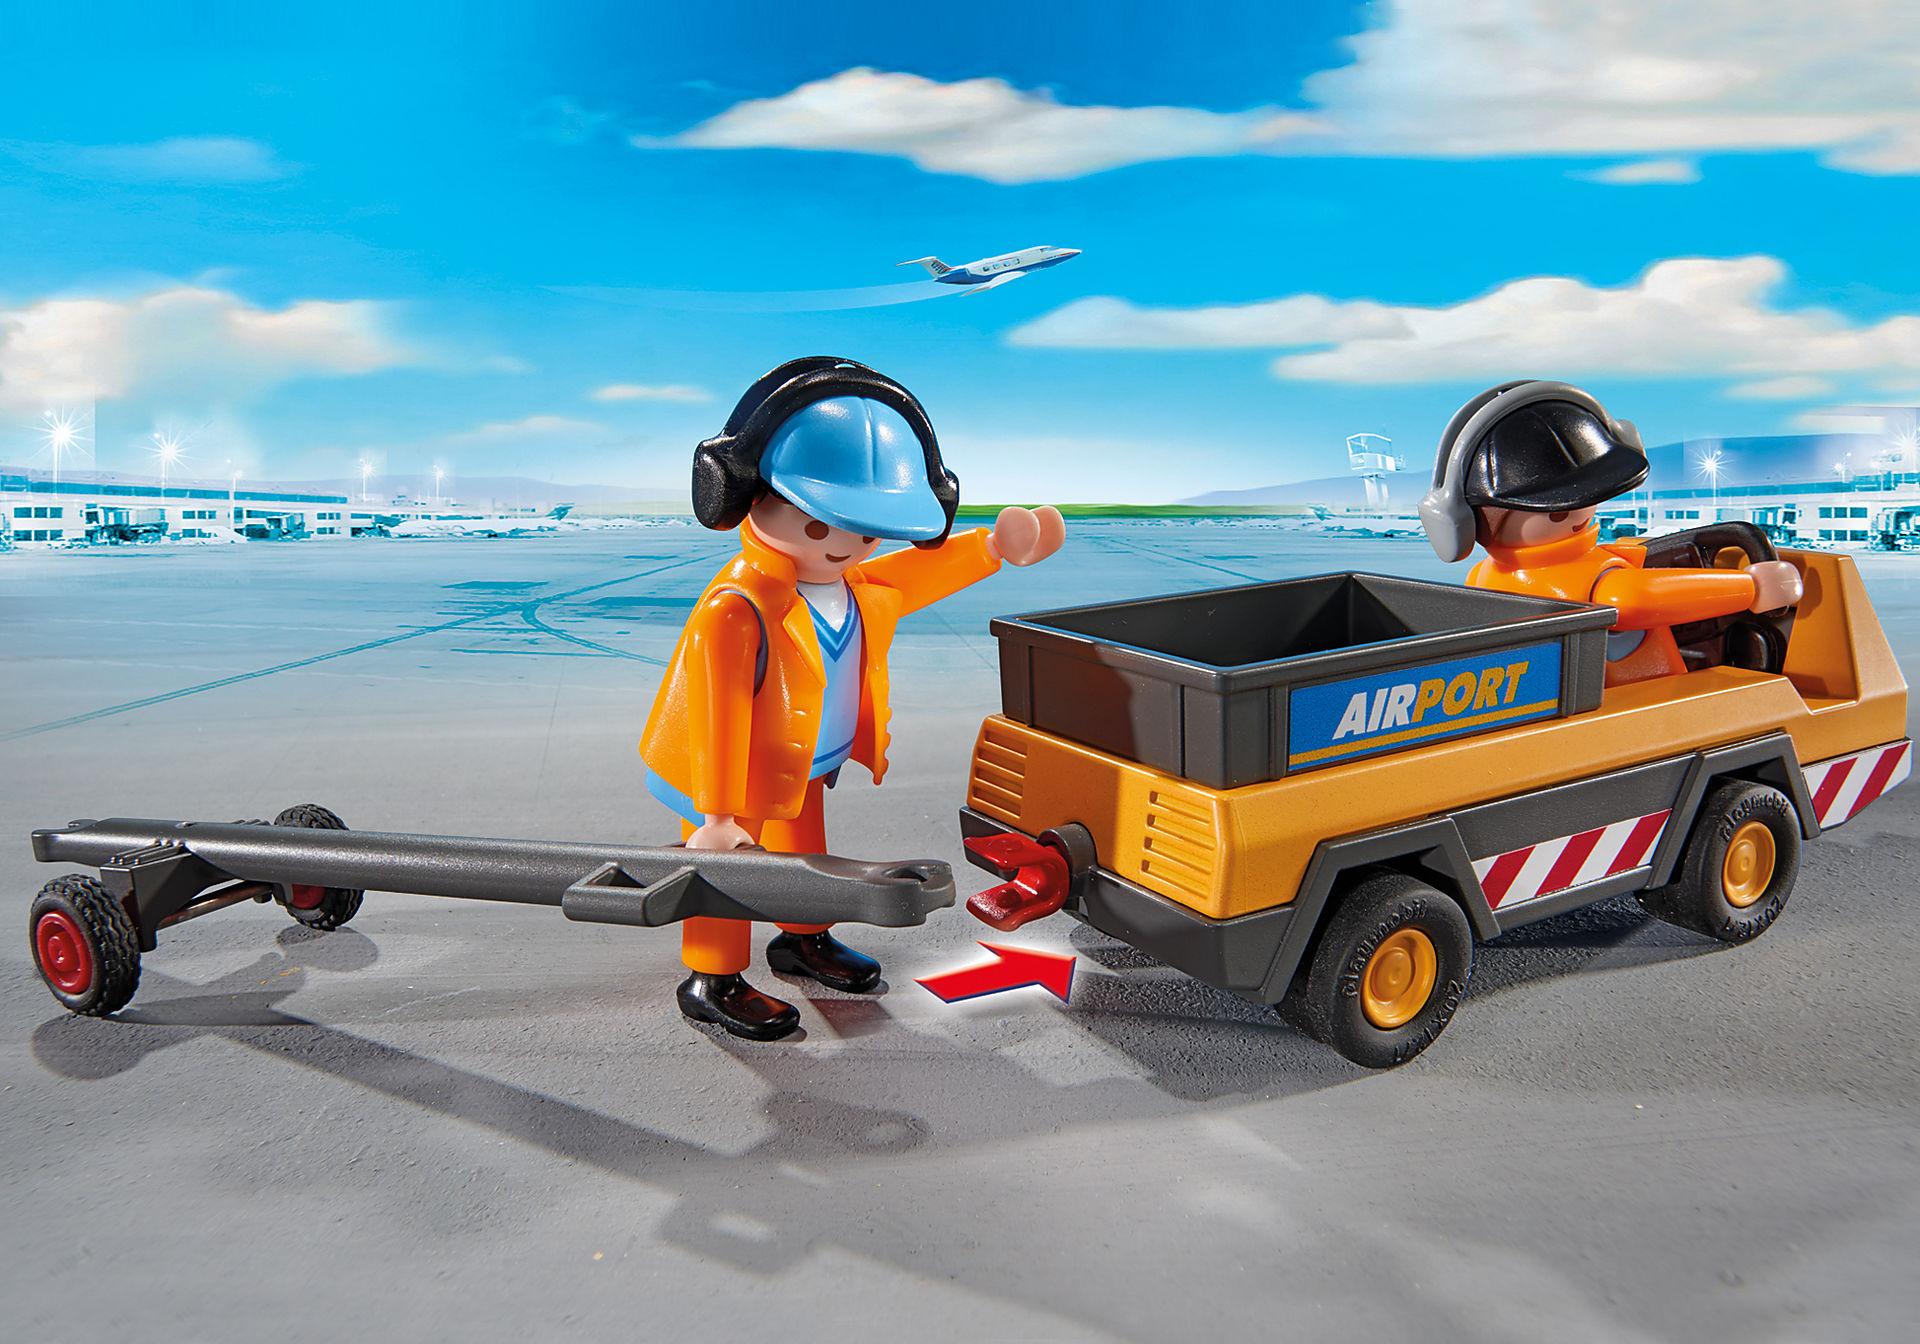 http://media.playmobil.com/i/playmobil/5396_product_extra1/Aircraft Tug with Ground Crew